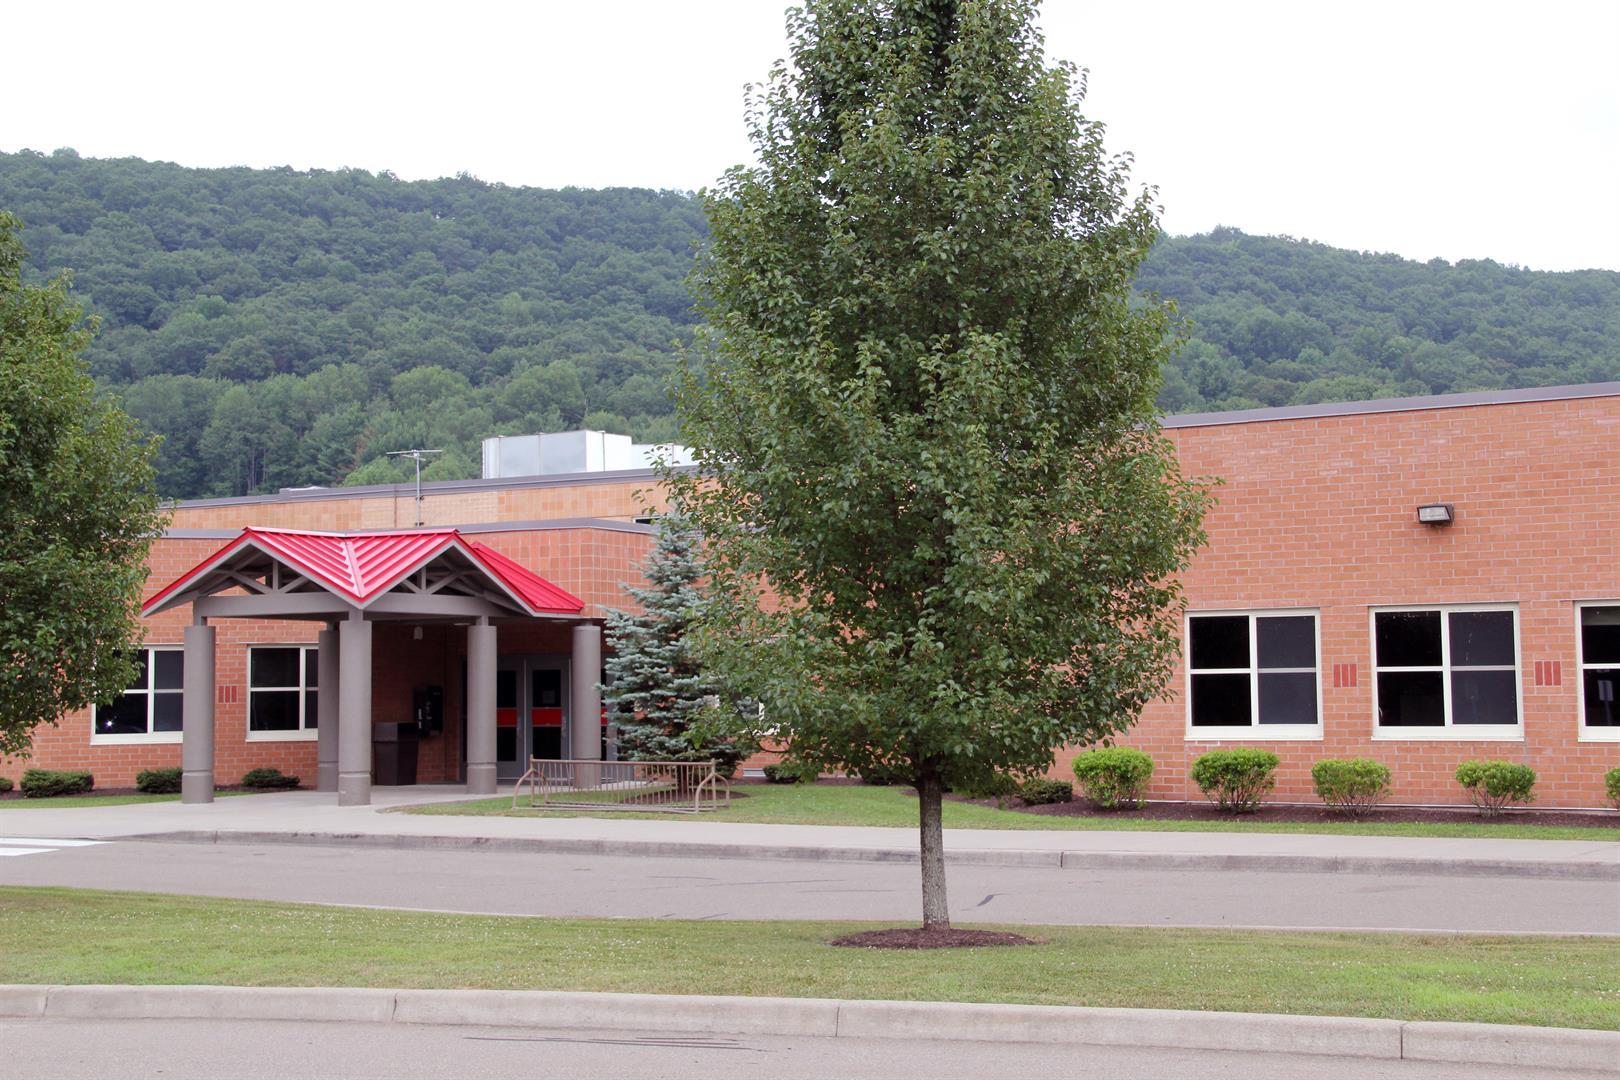 chenango valley middle school building